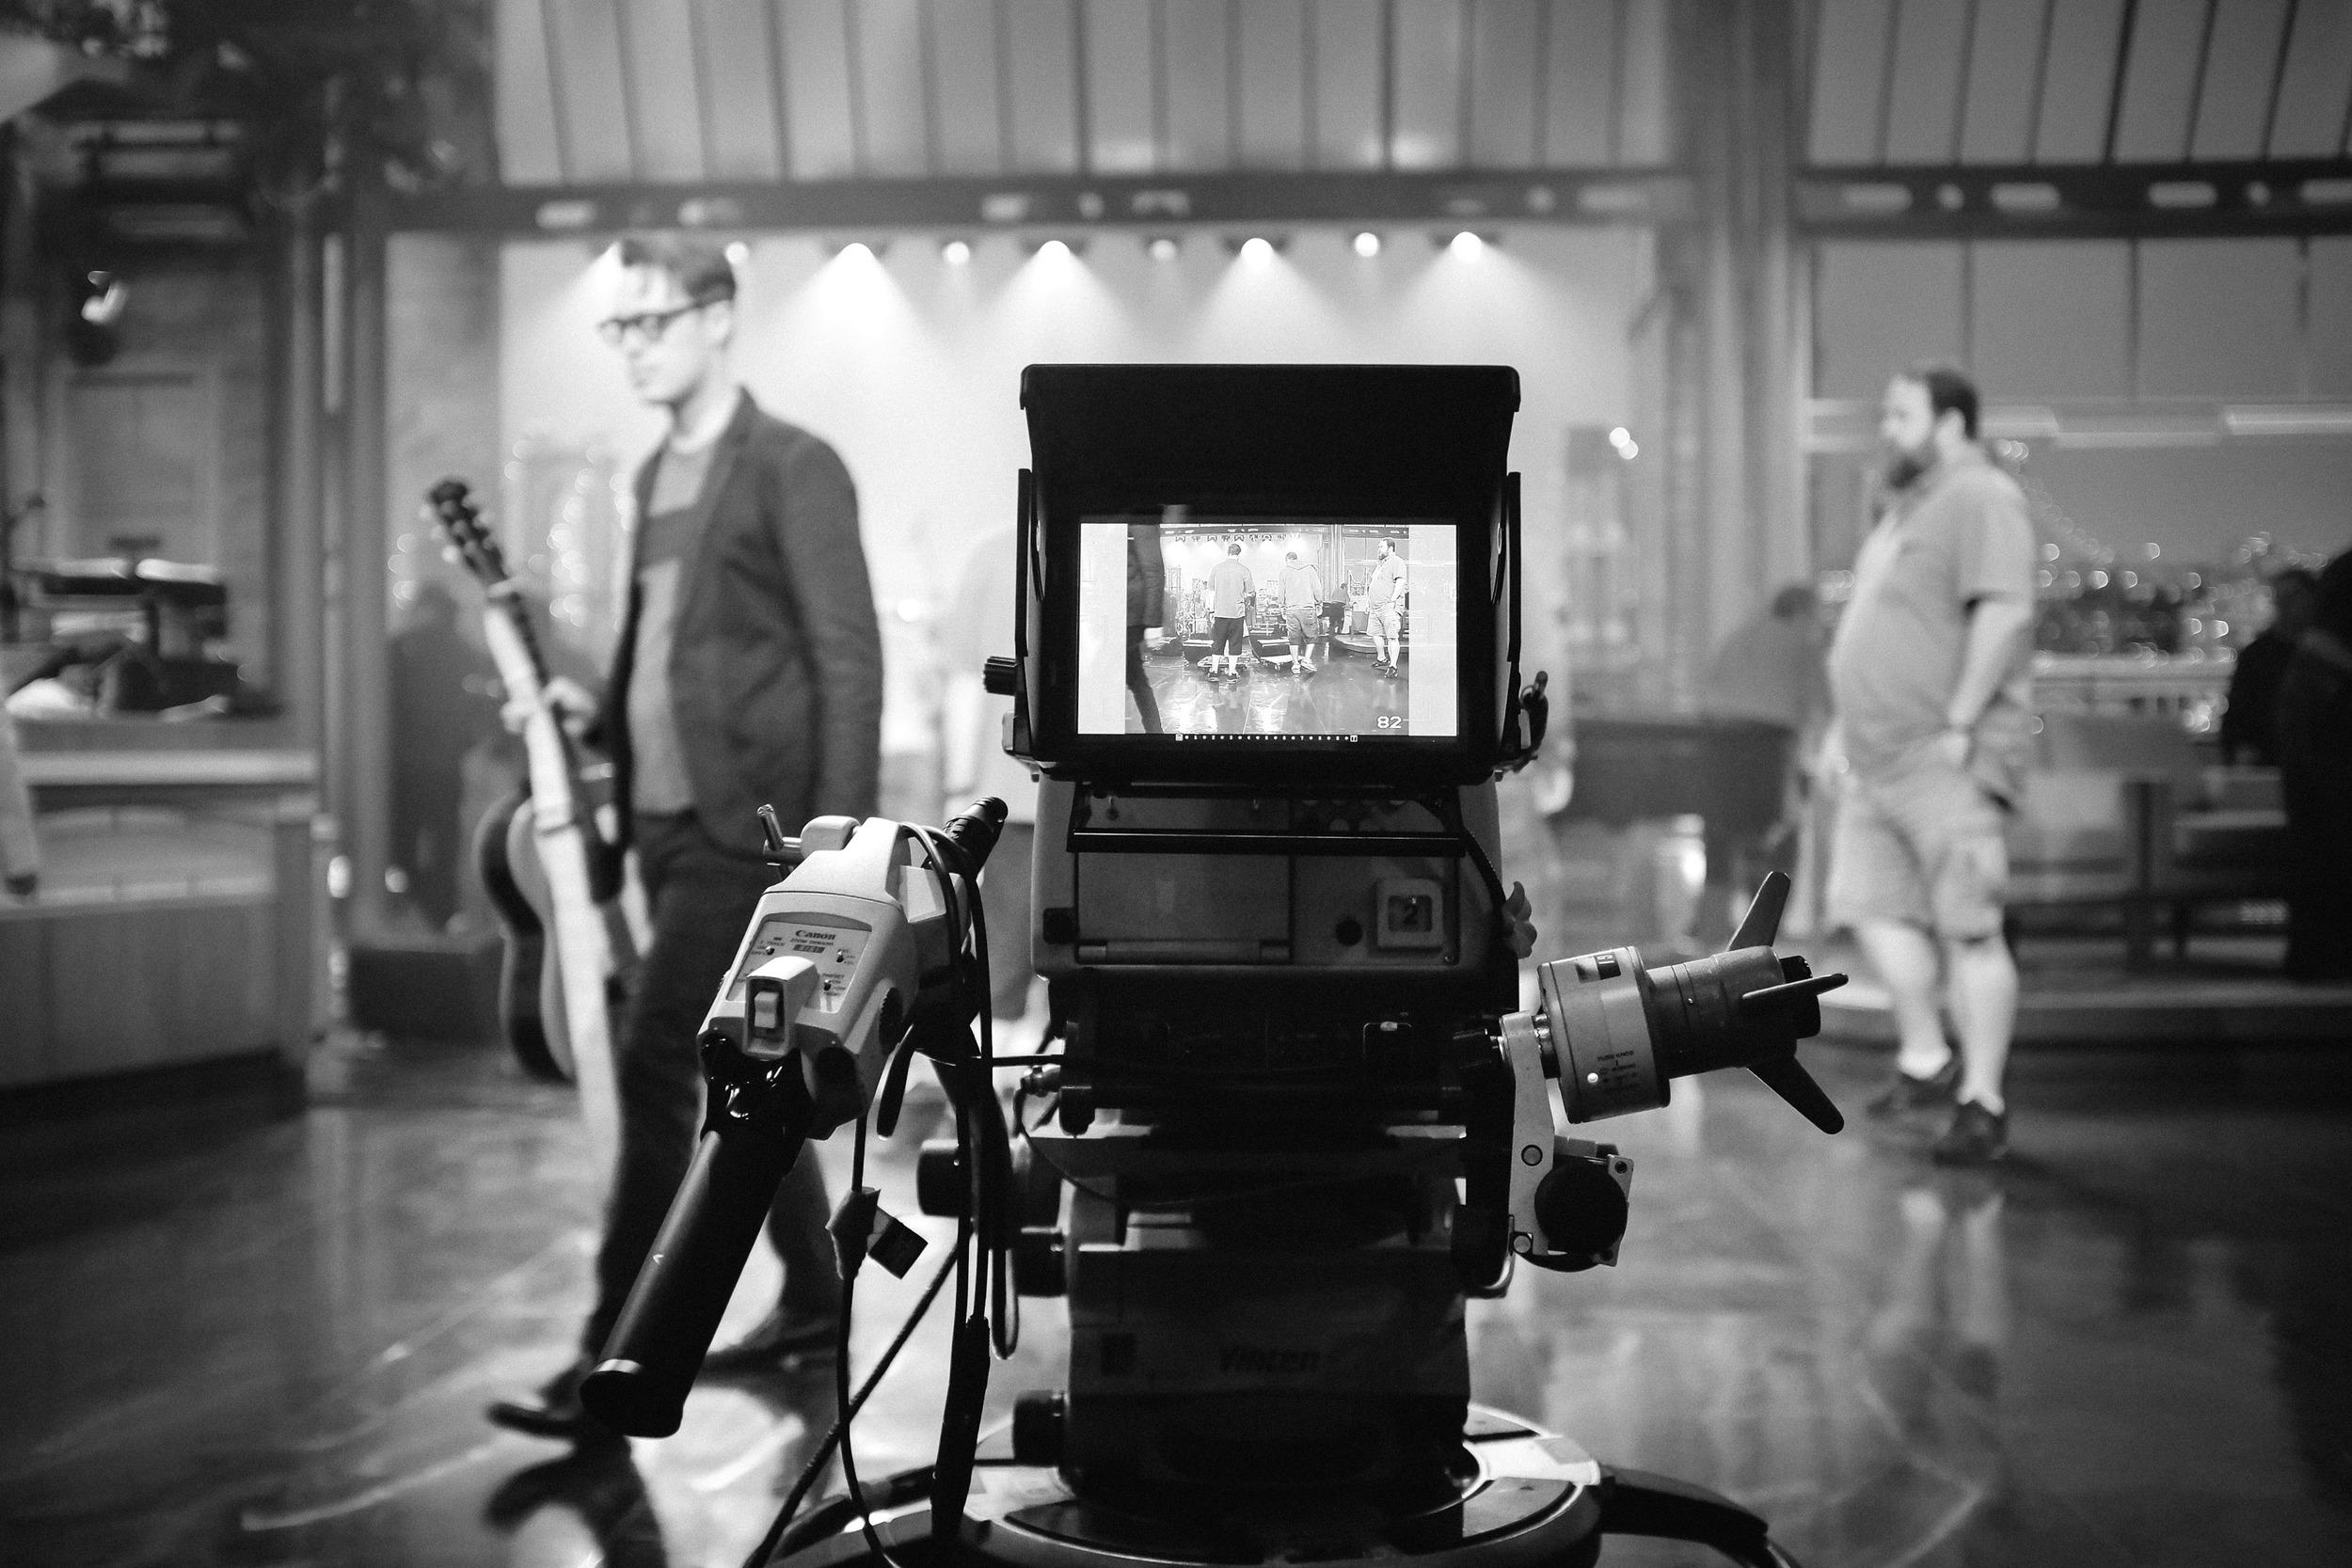 David Letterman Show, with Jeremy Messersmith